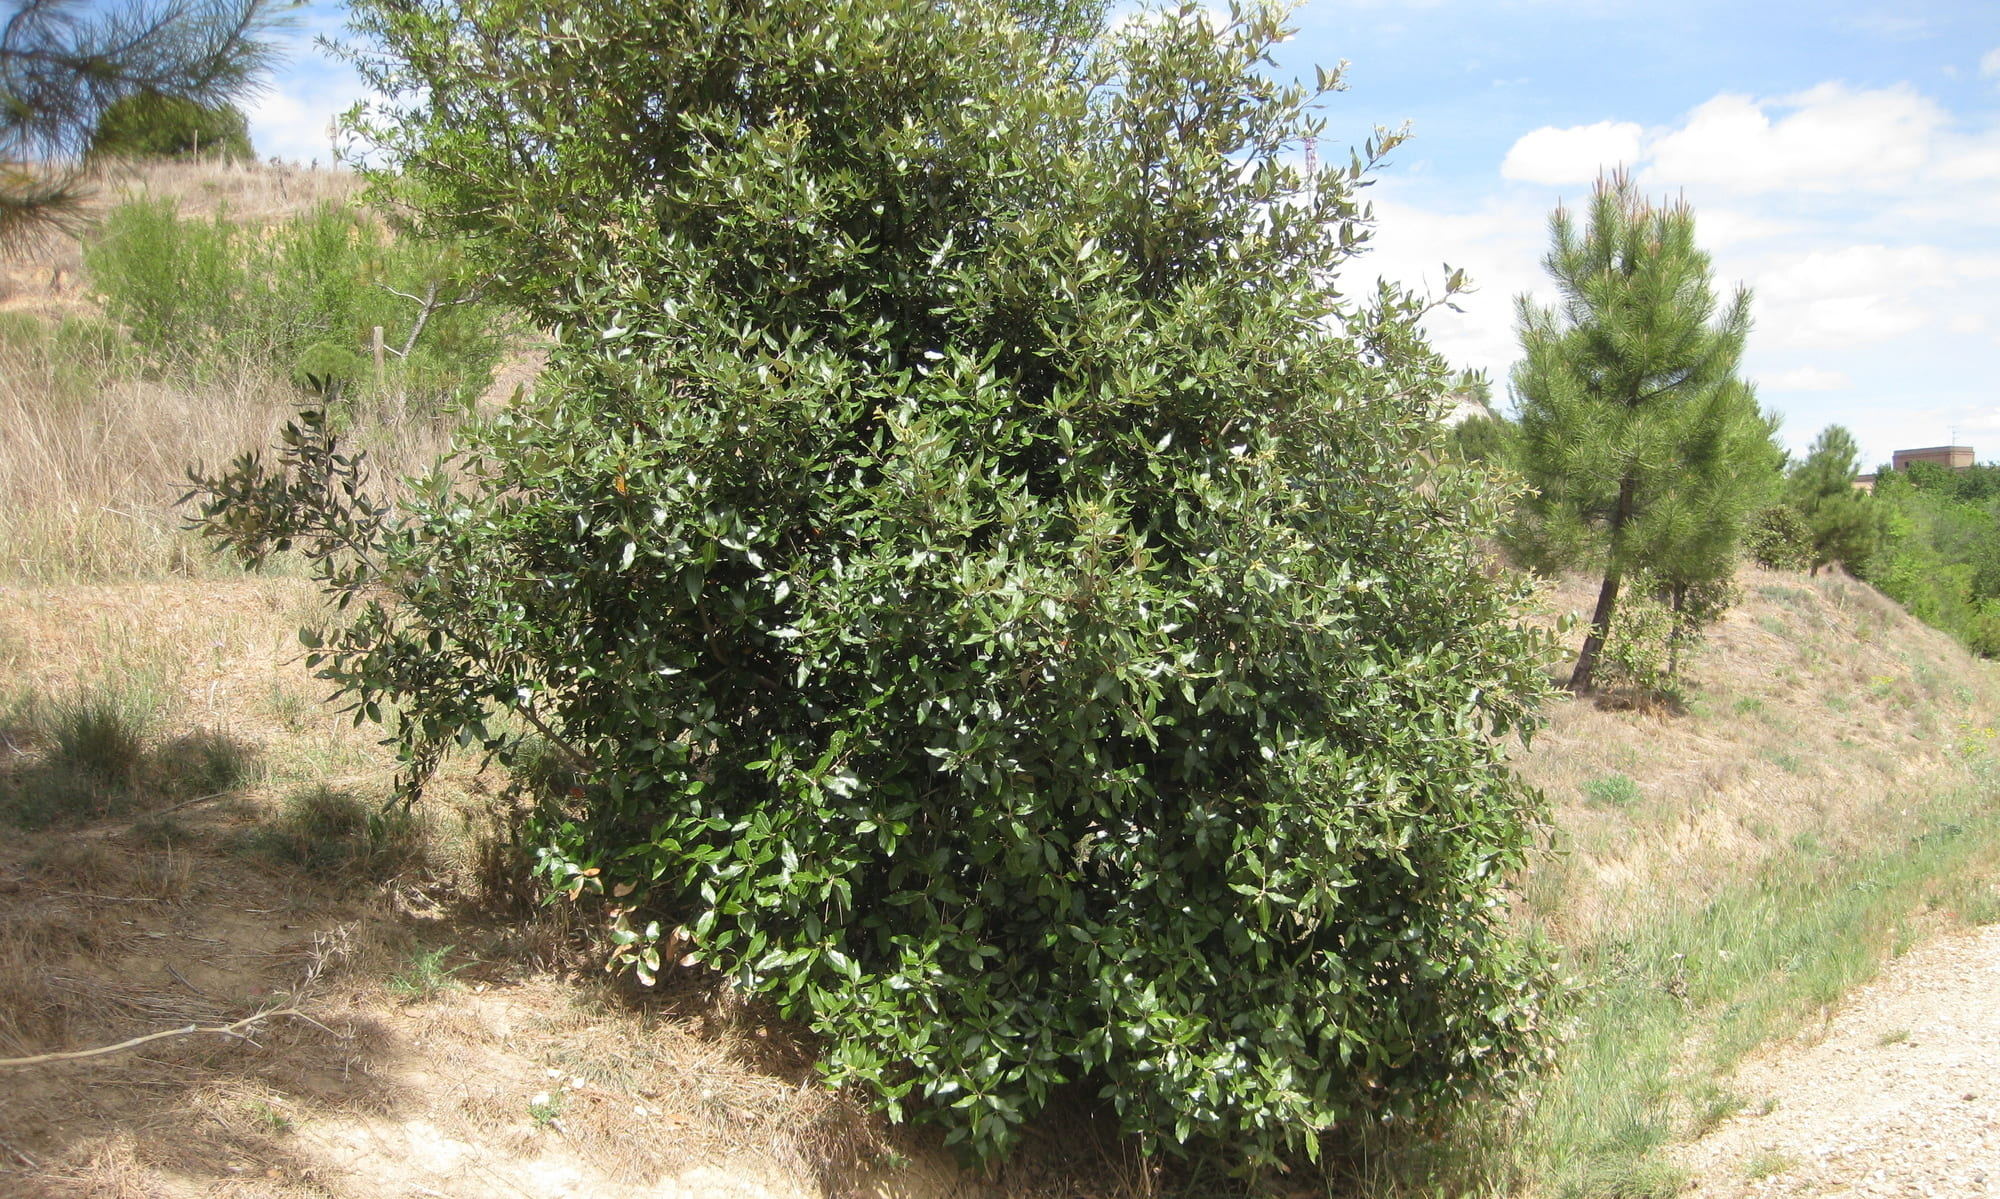 arbustos: carrasca